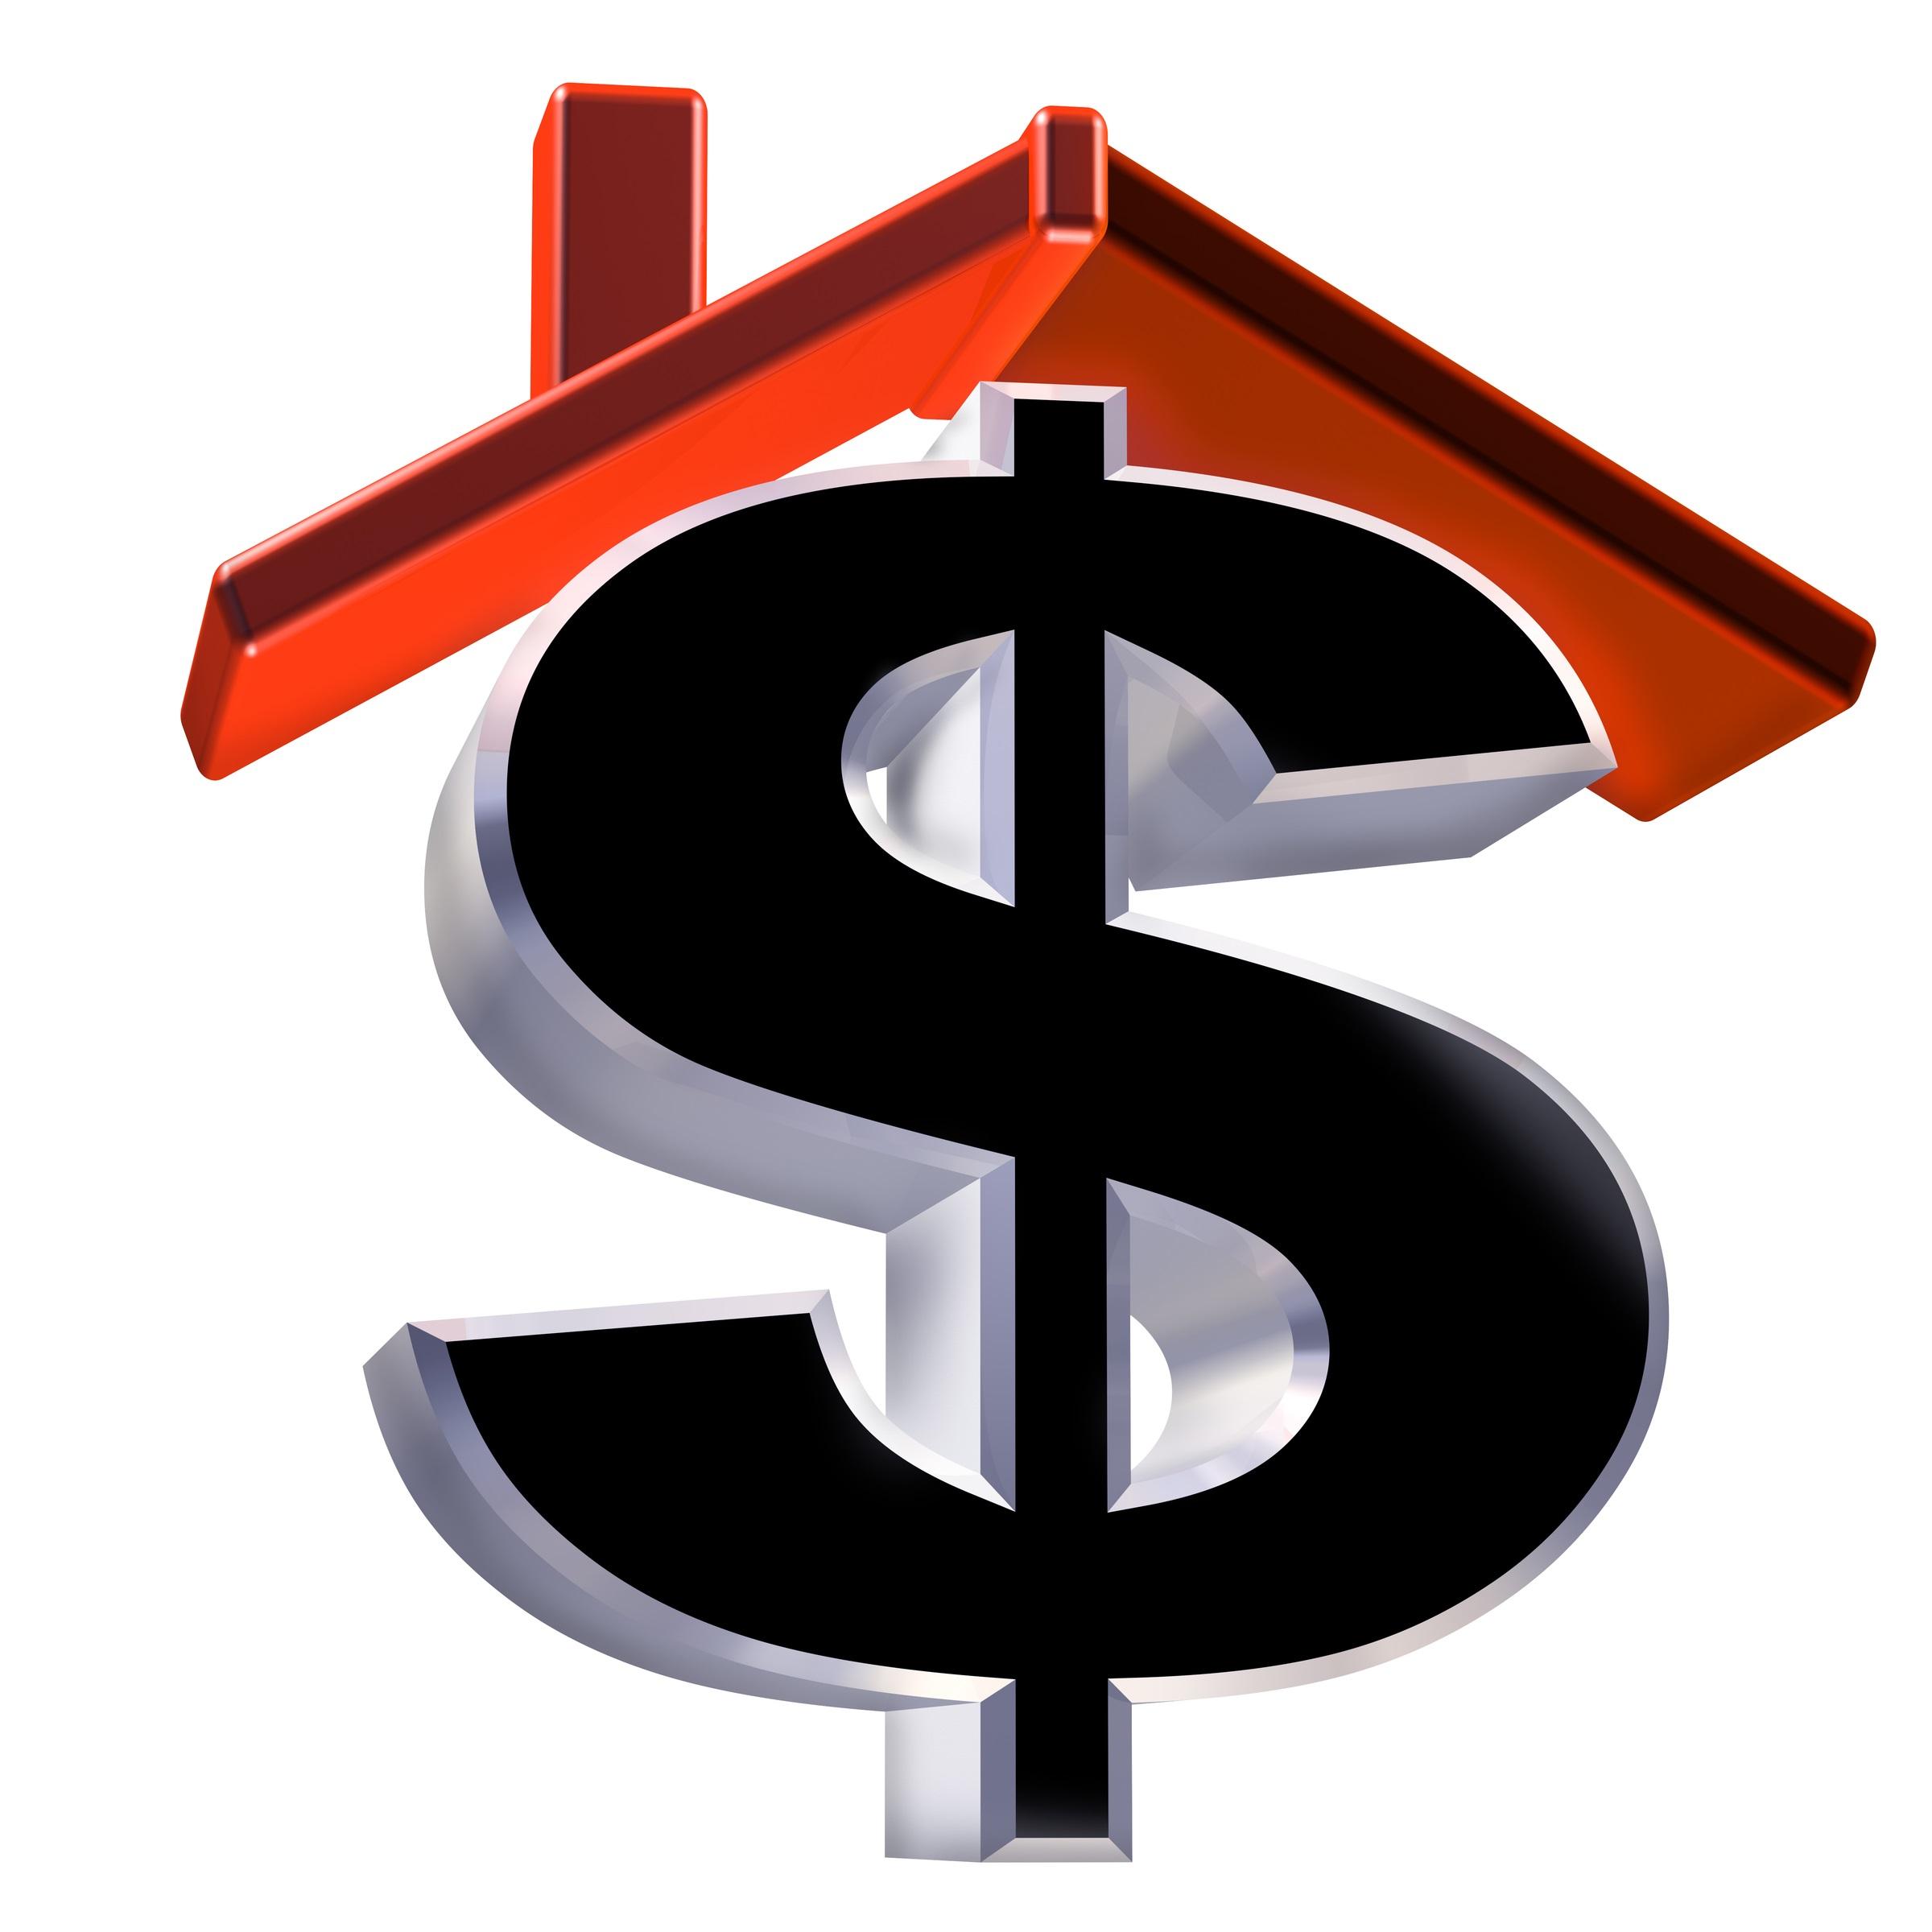 House and money symbol